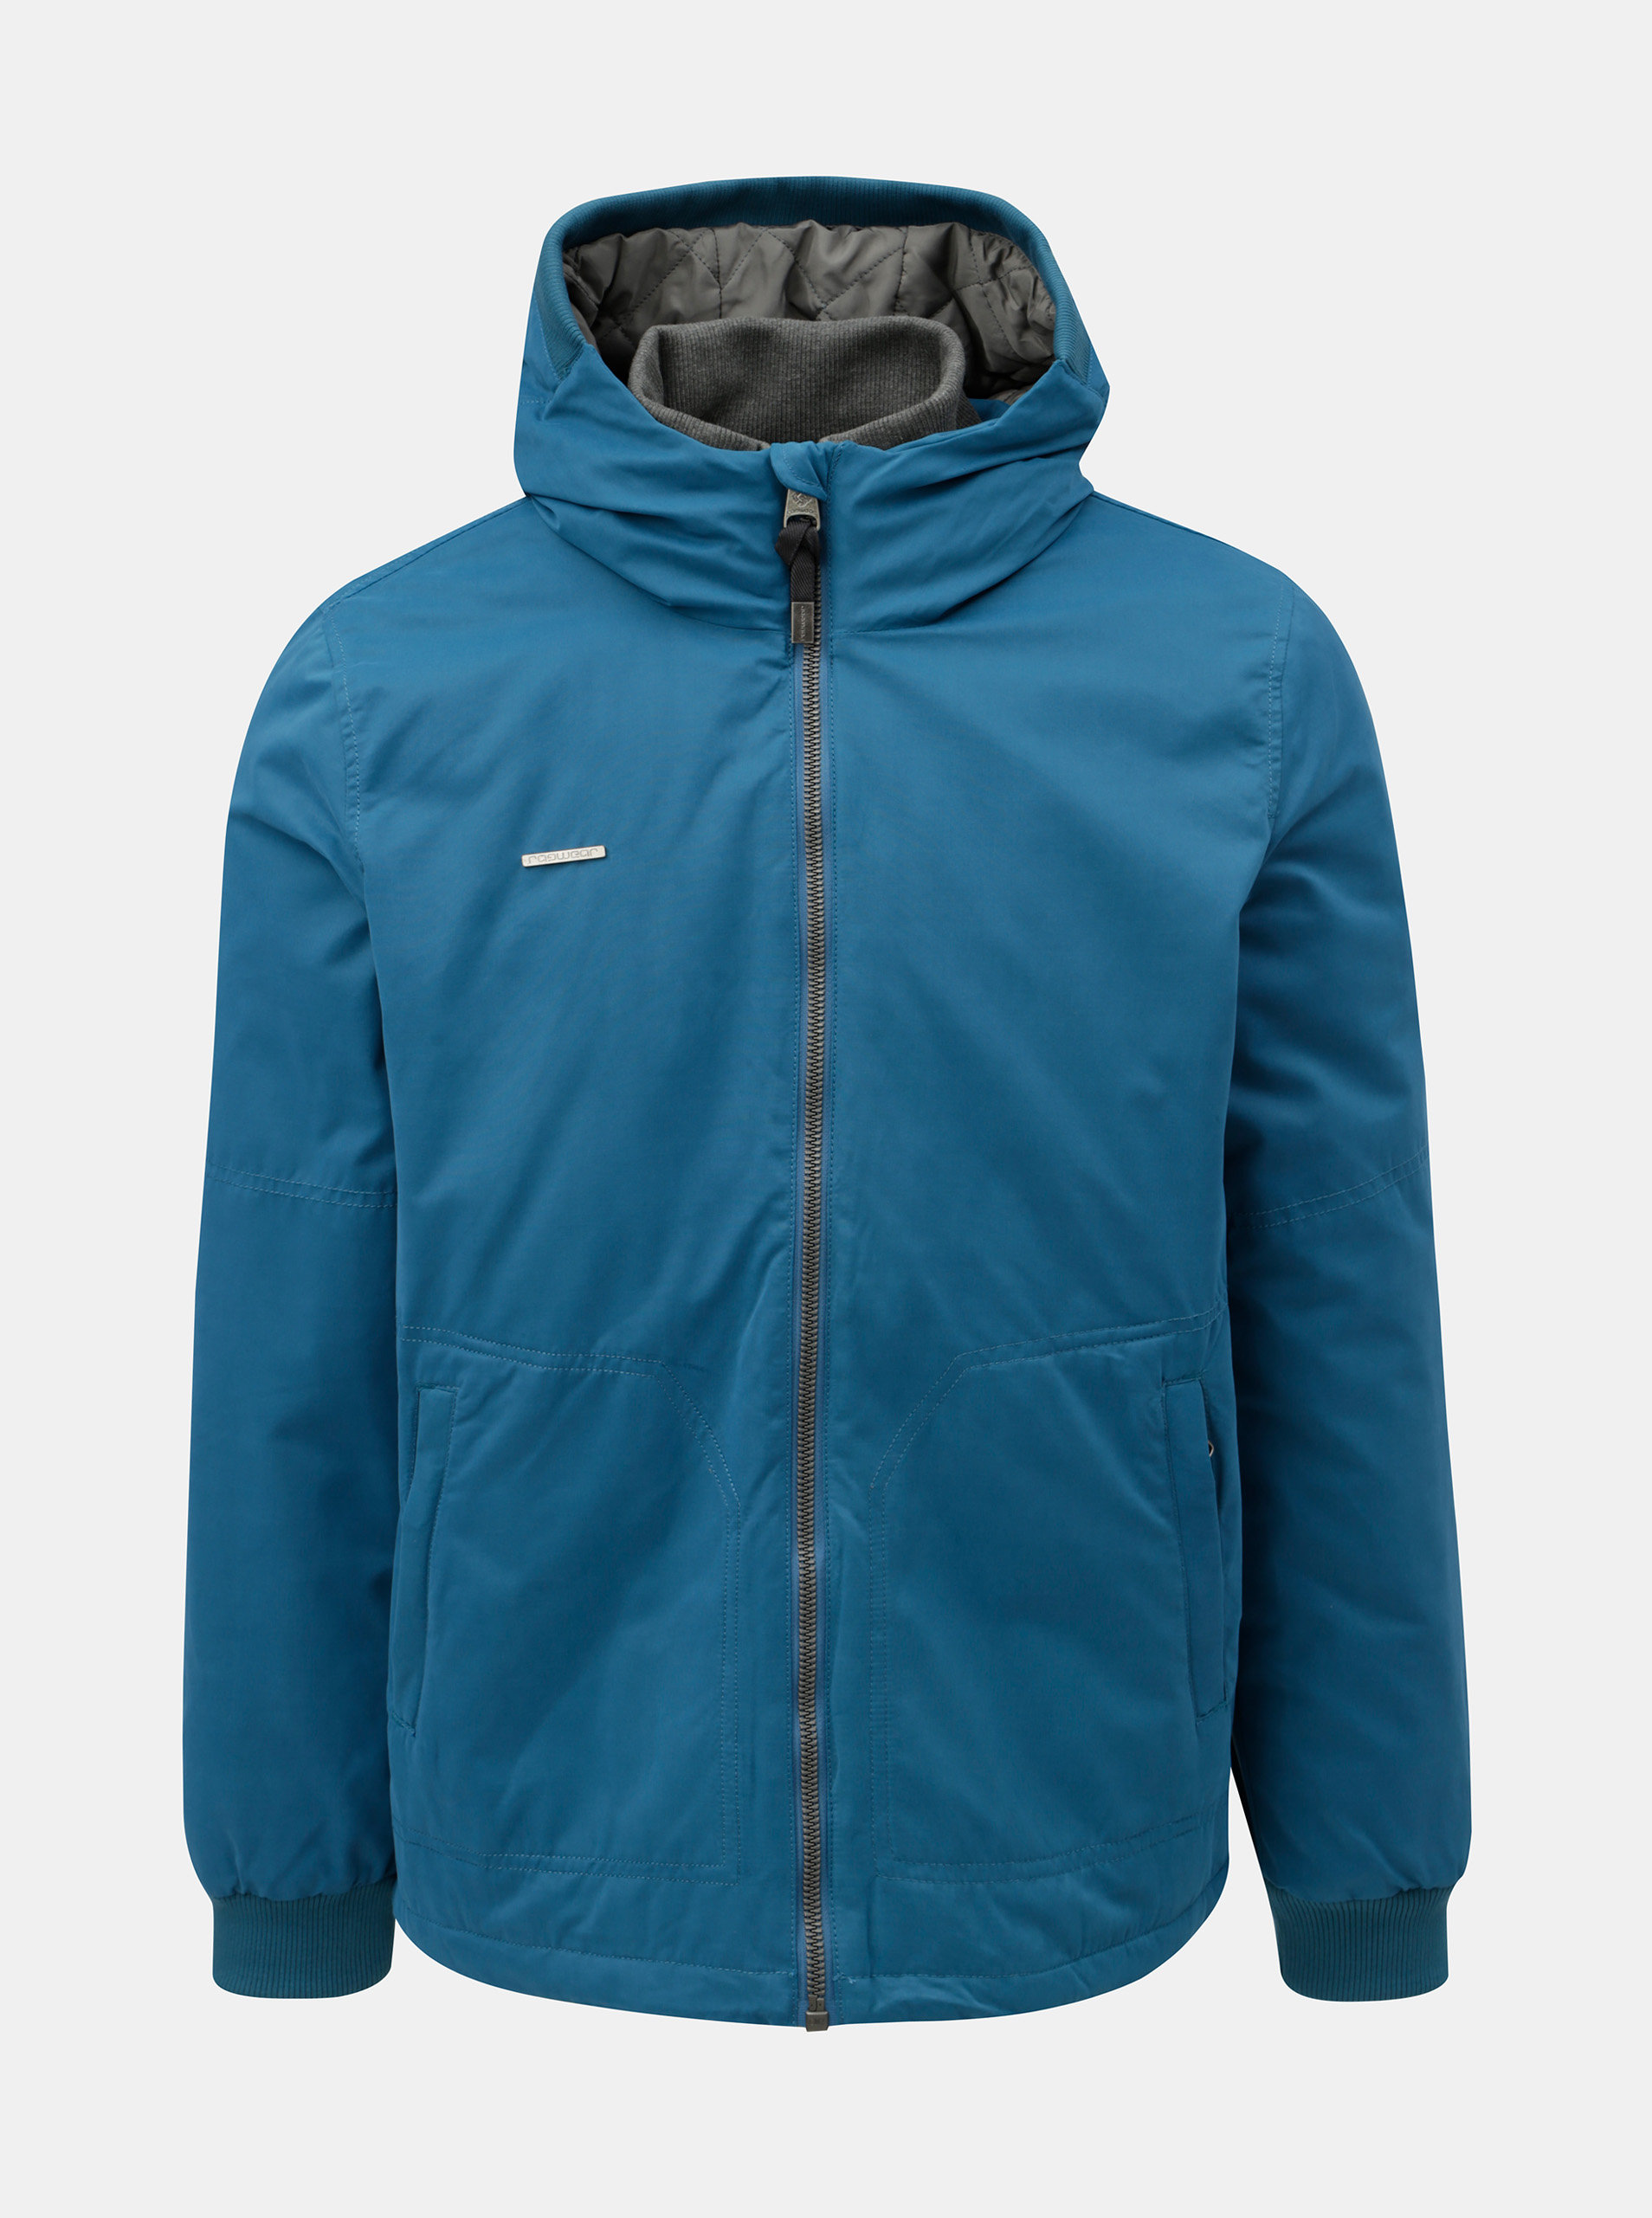 Modrá pánska zimná bunda s kapucňou Ragwear ... b5b810d0a66